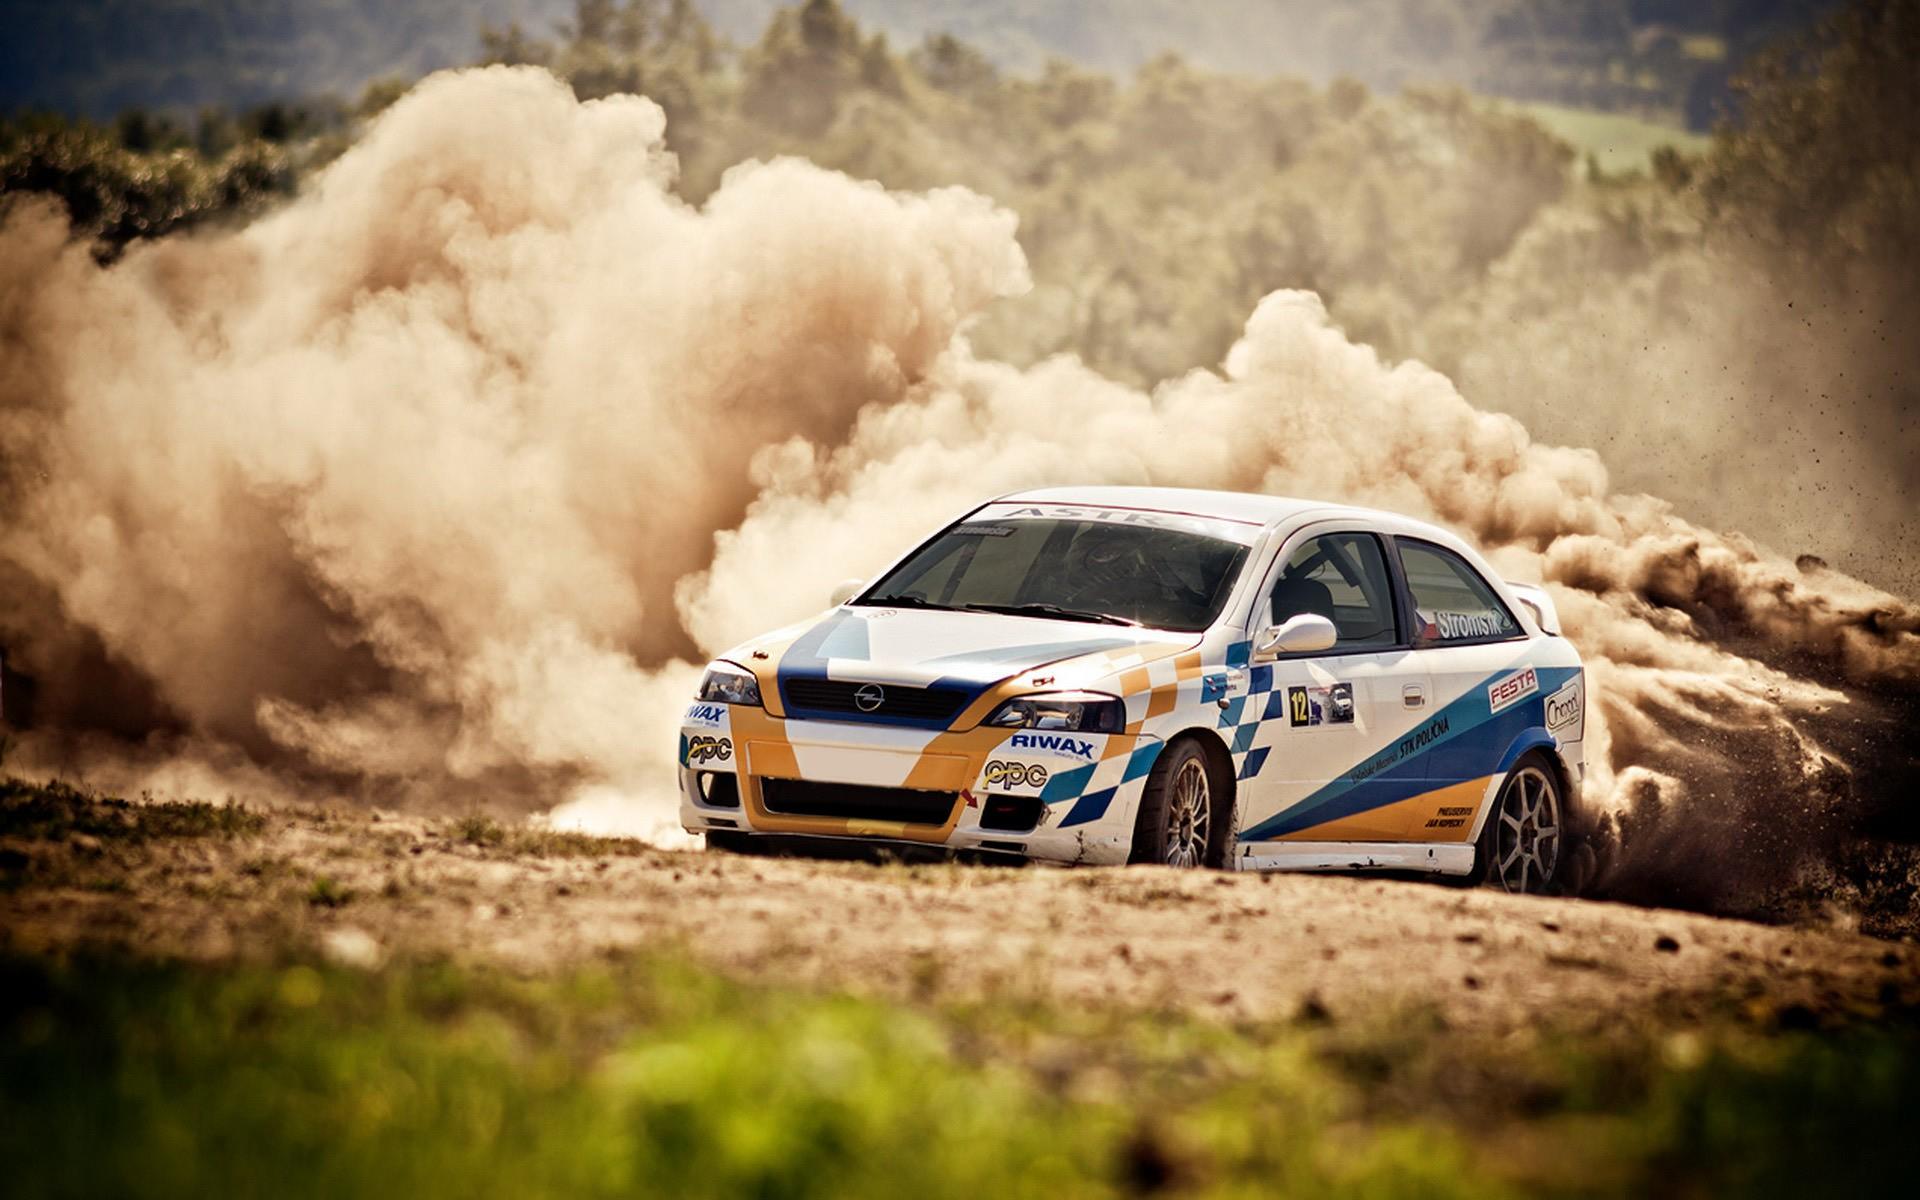 DiRT Rally Desktop wallpapers